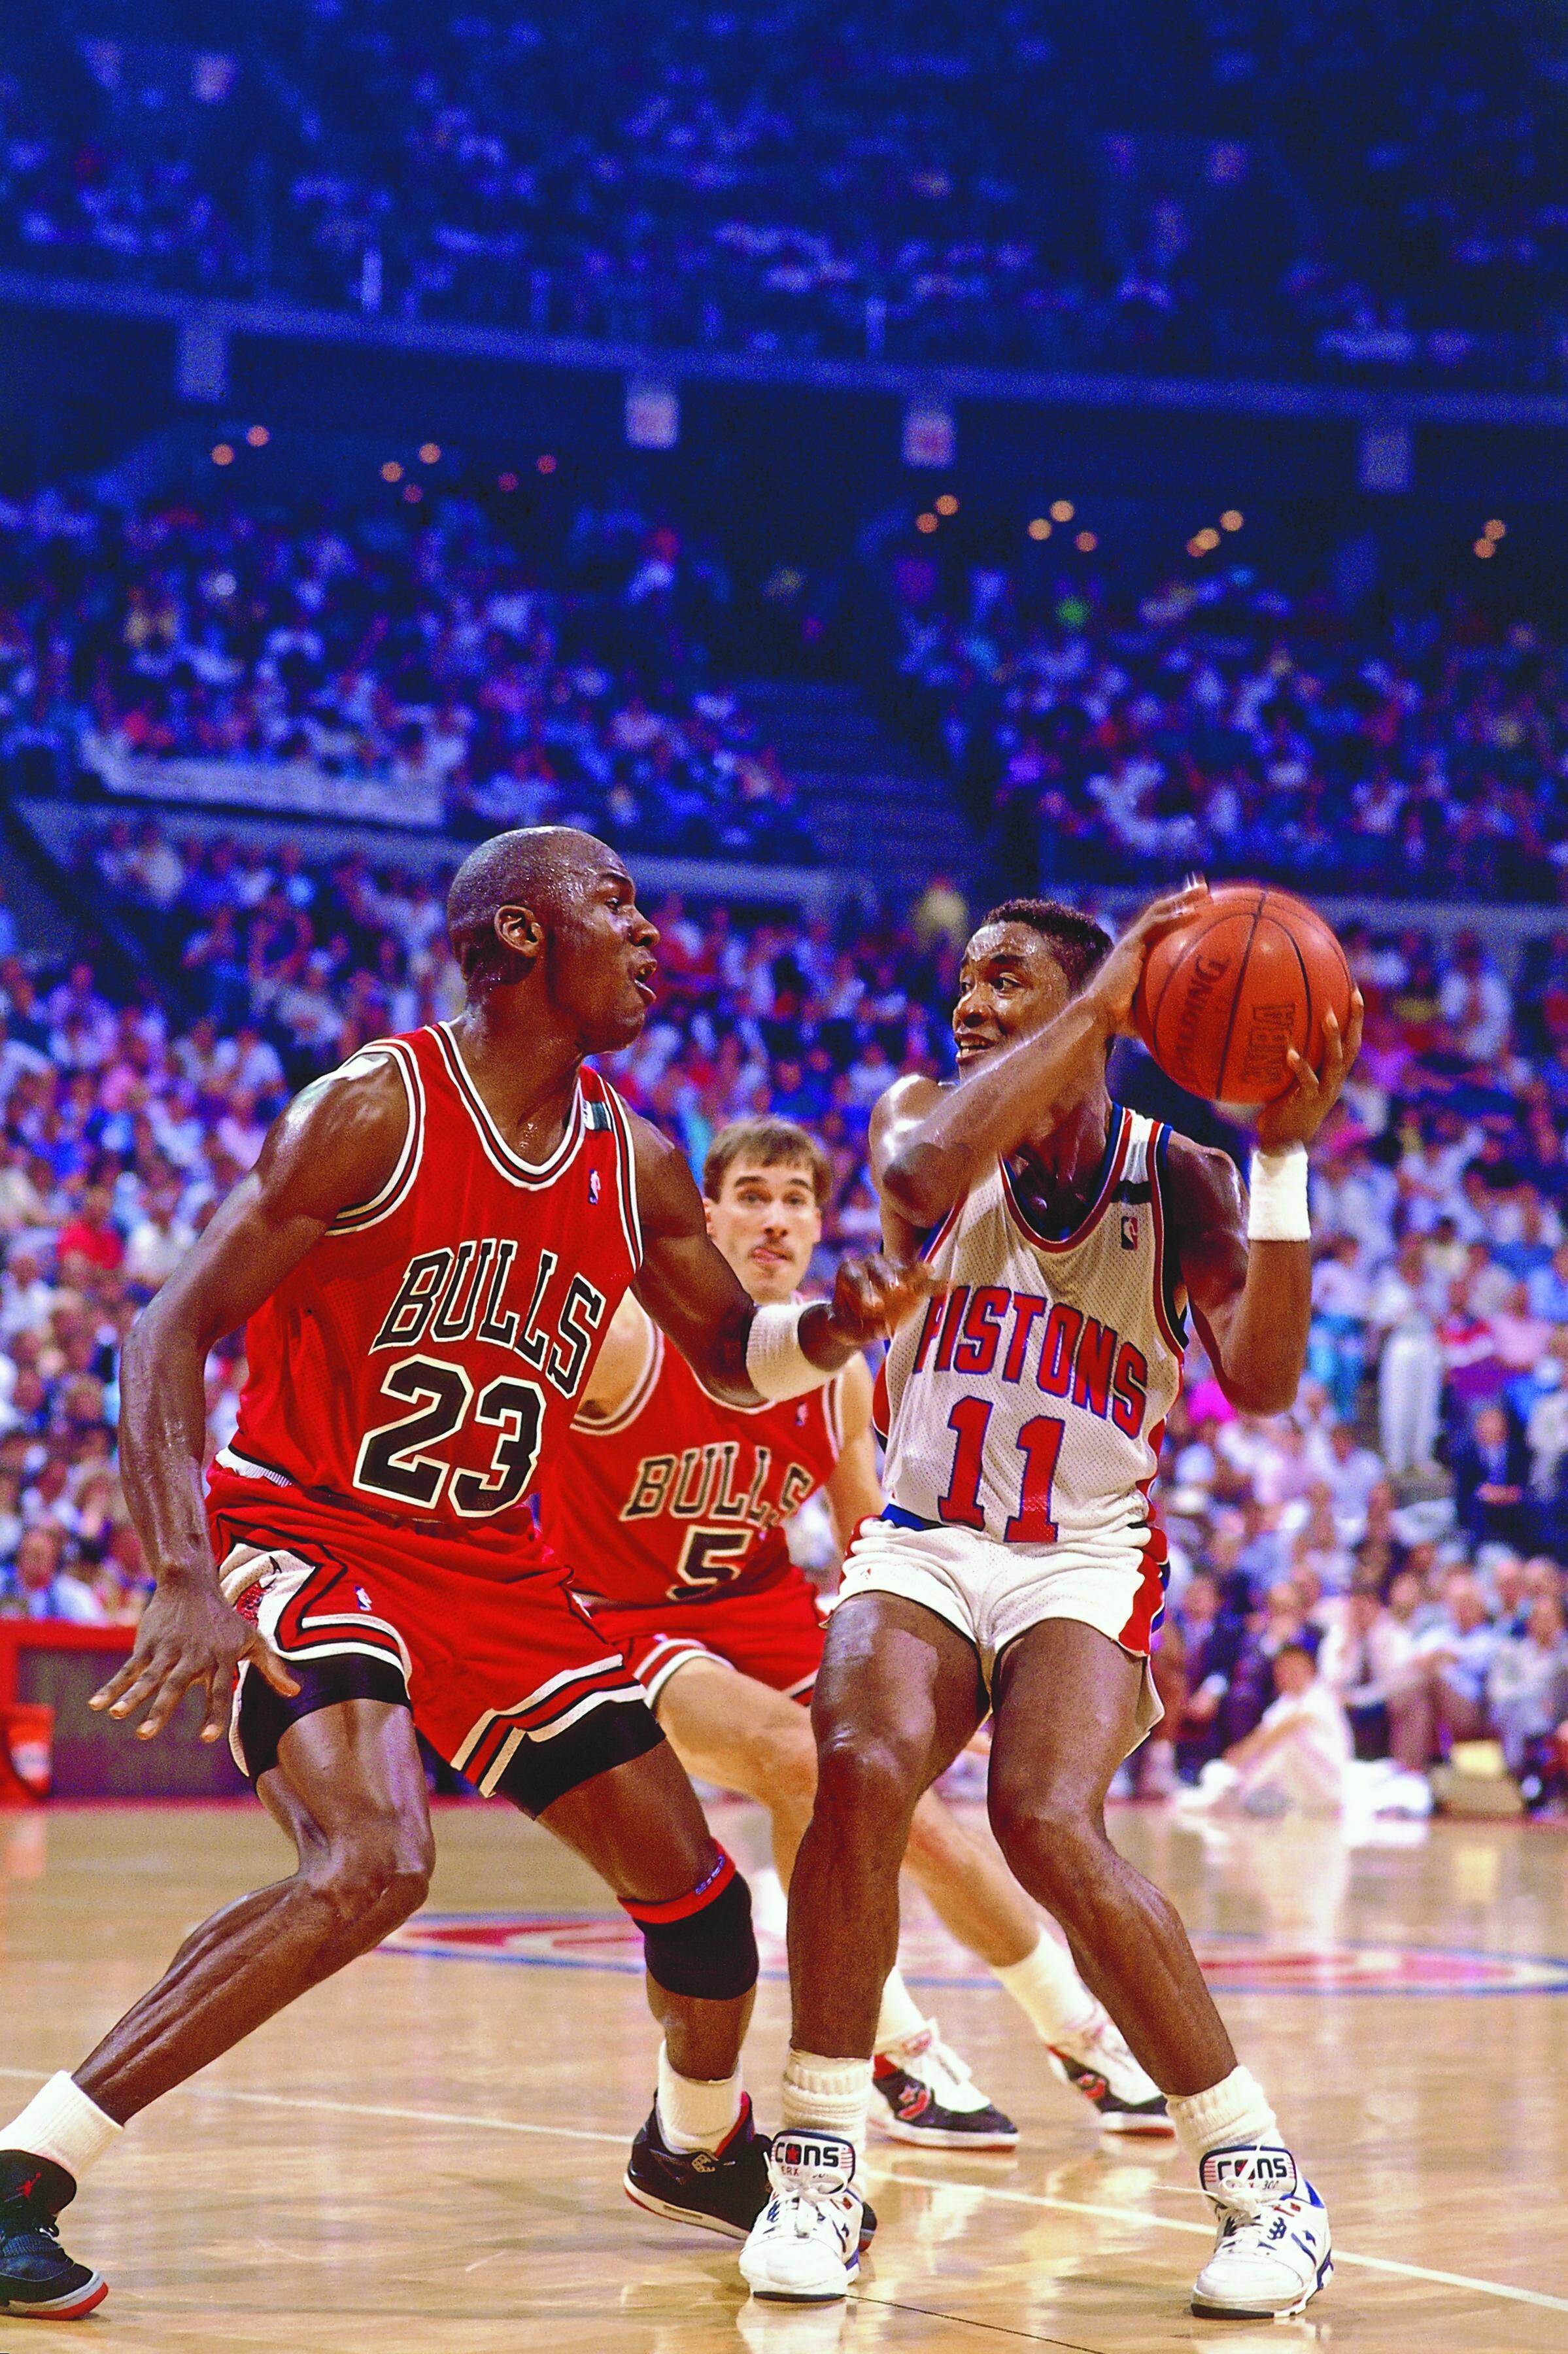 Isiah Thomas and Michael Jordan face off in 1988.